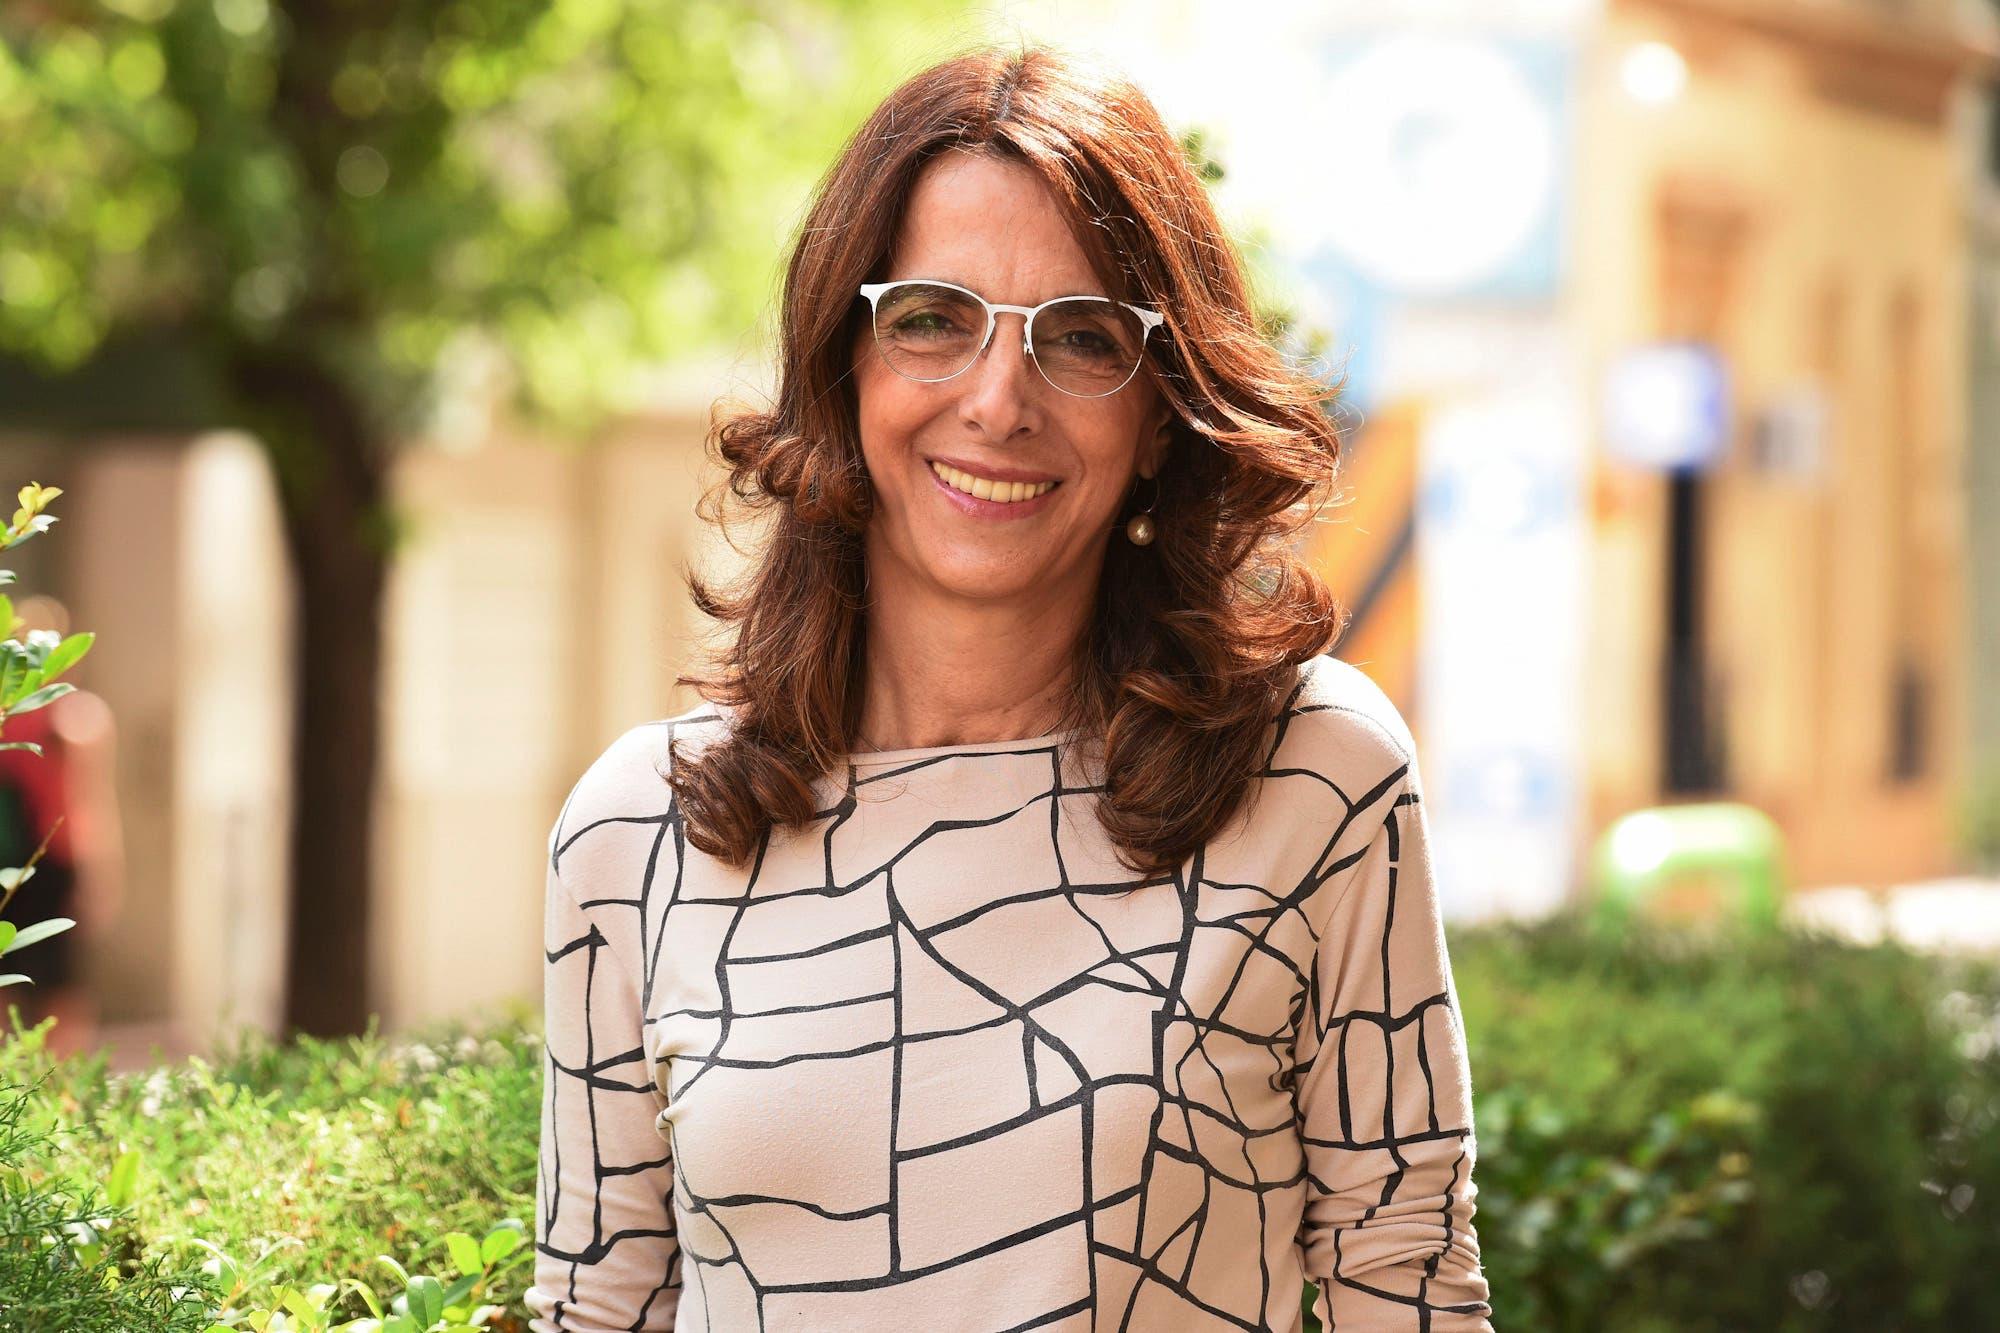 María Eugenia Bielsa, acostumbrada a incomodar al peronismo